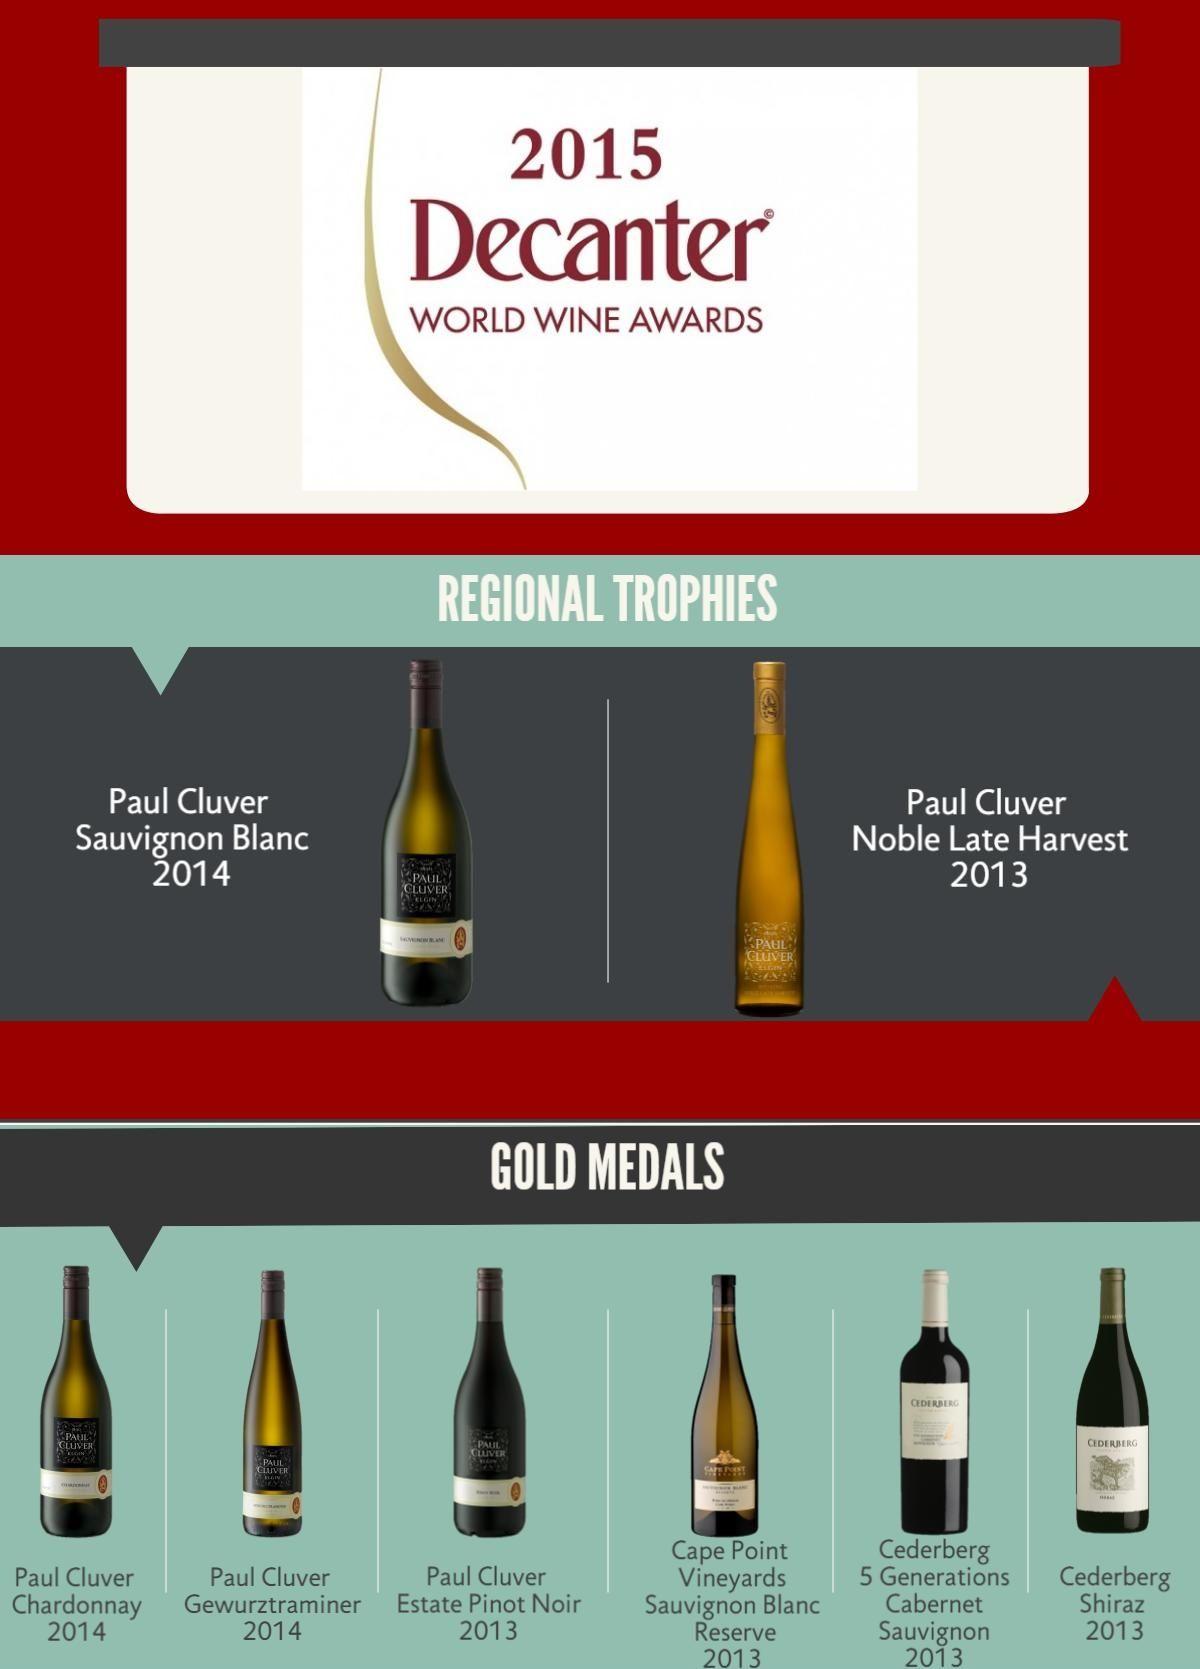 Decanter Award Joy For Paul Cluver Cape Point Vineyards And Cederberg Cape Point Vineyards Wine Cooler Cape Point